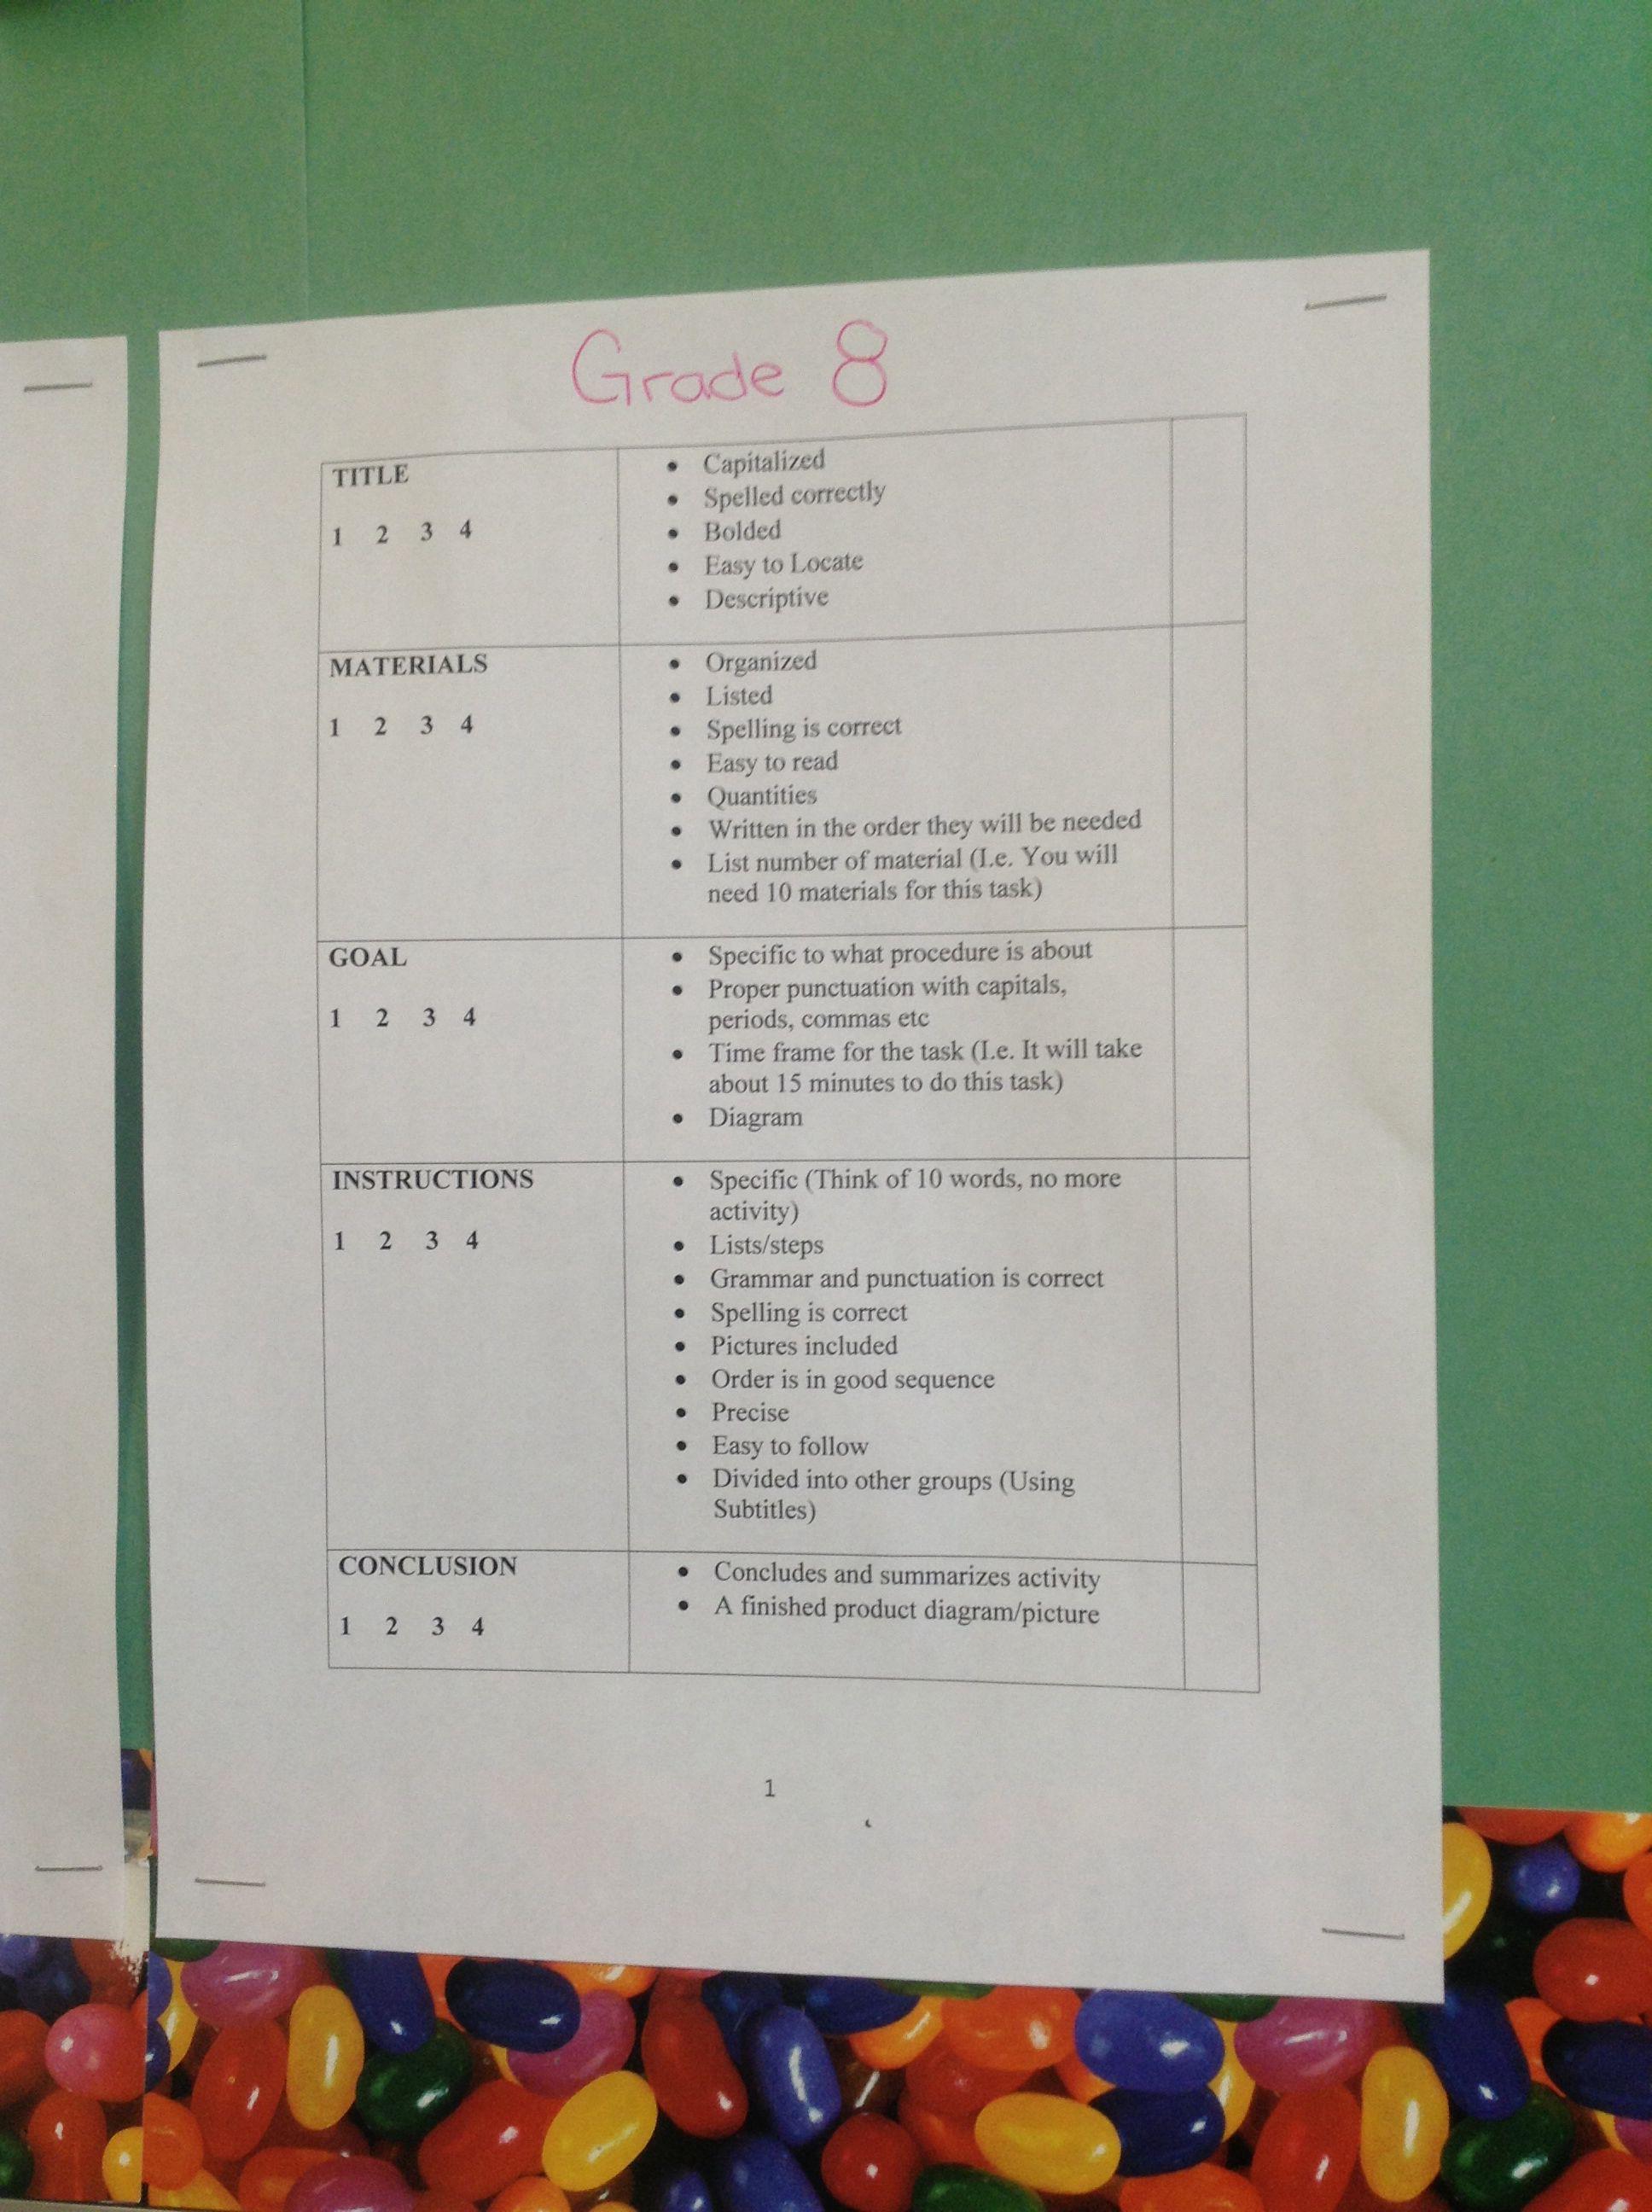 Procedural Writing Checklist